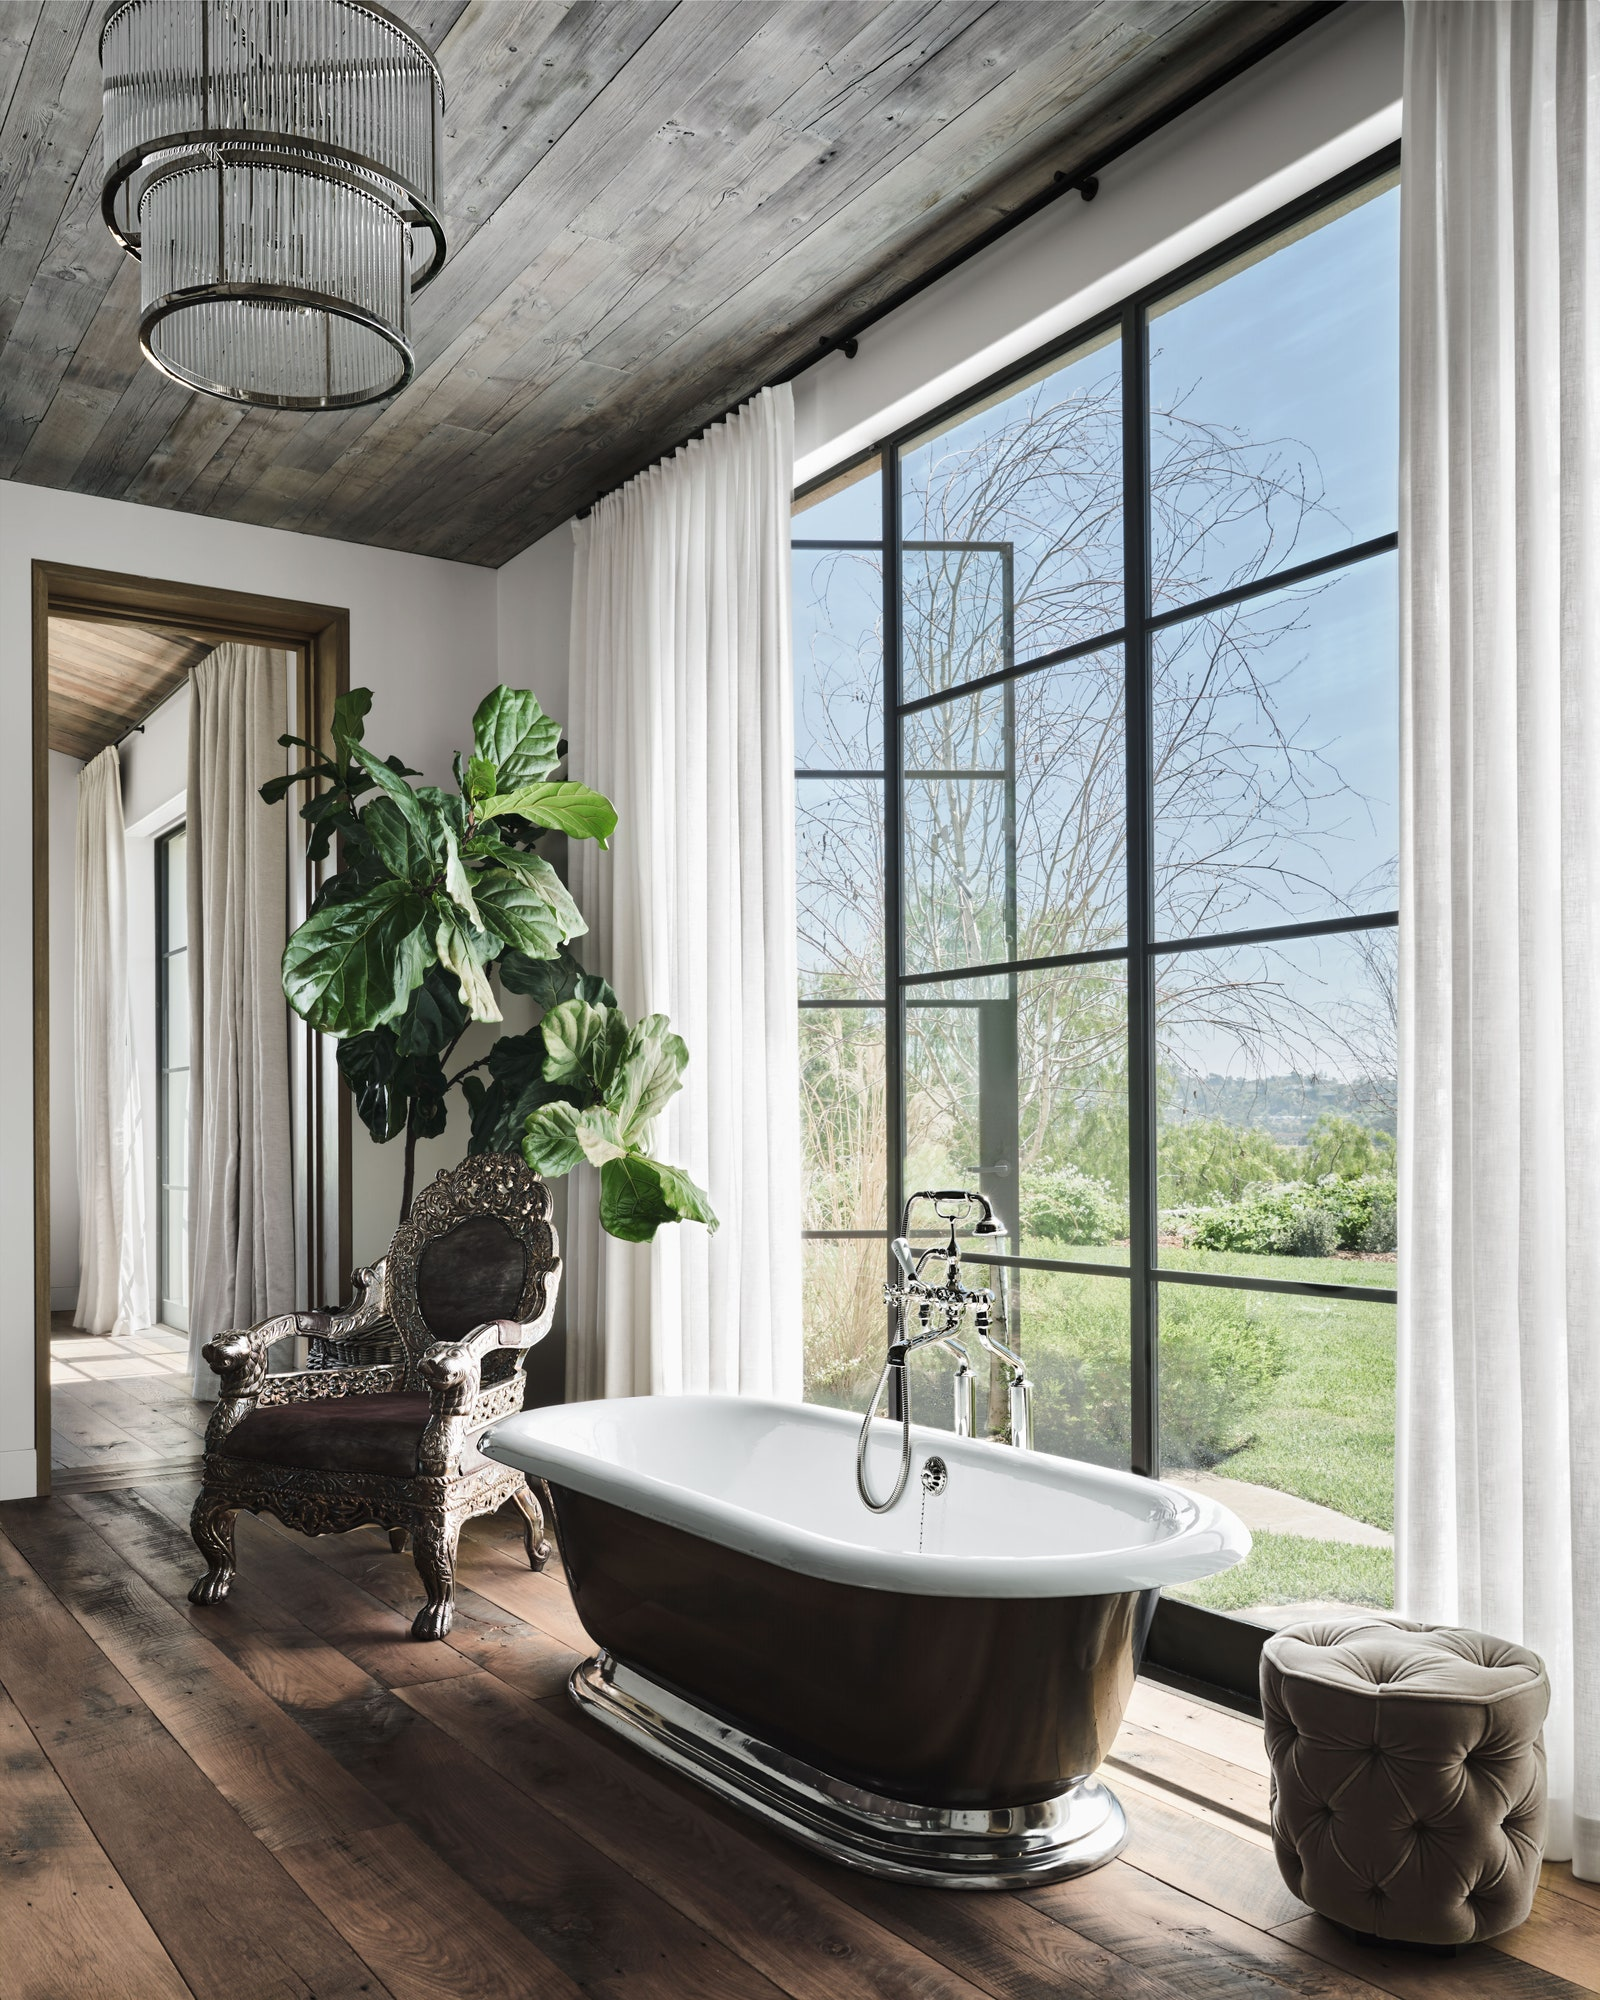 Фото: Architectural Digest/Douglas Friedman